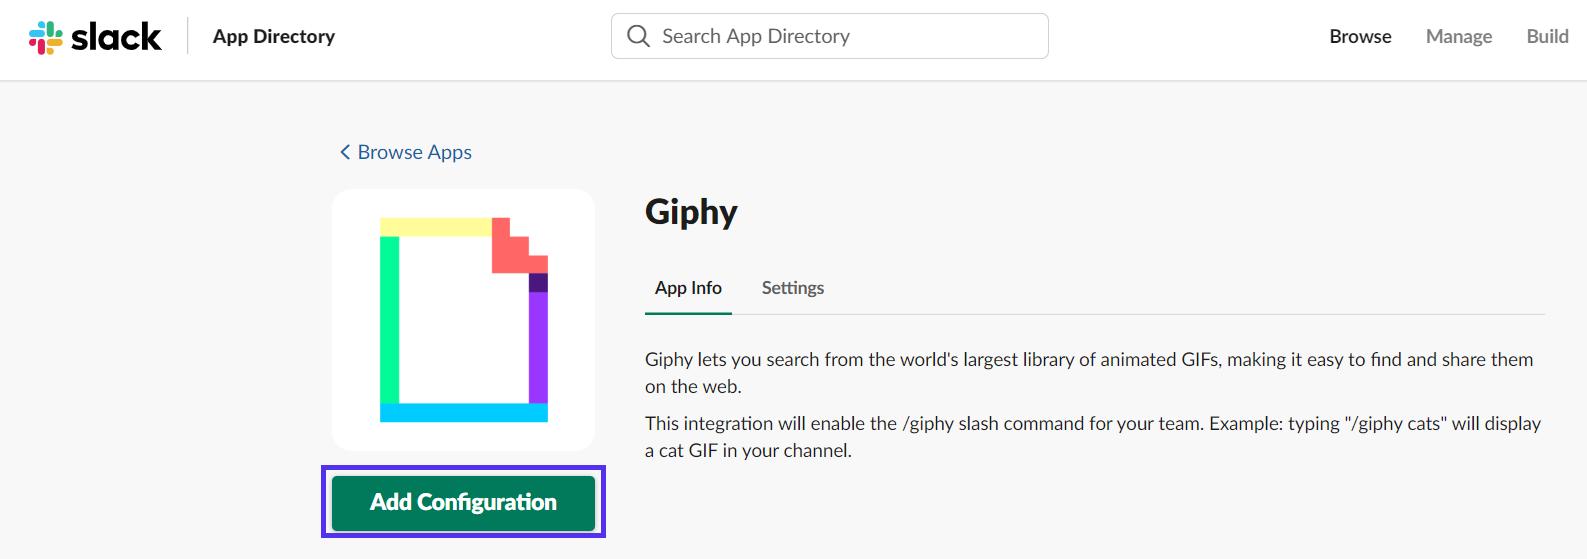 Giphy Lägga till konfiguration